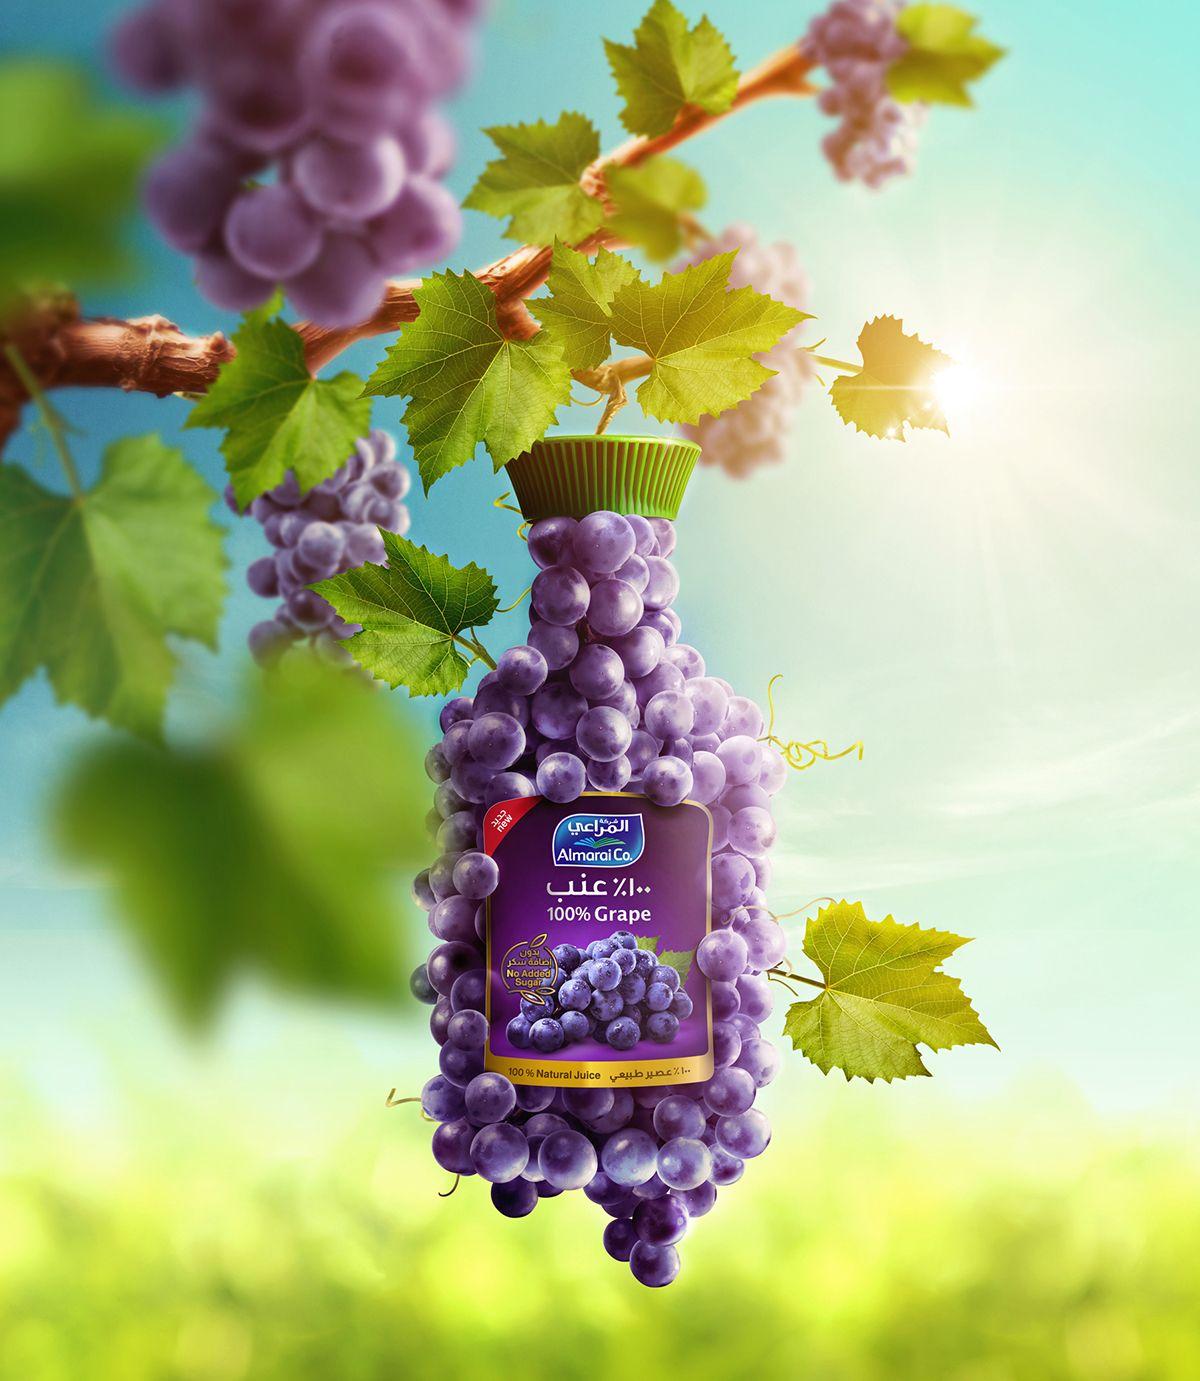 Almarai Natural Grape On Behance Creative Poster Design Graphic Design Advertising Ads Creative